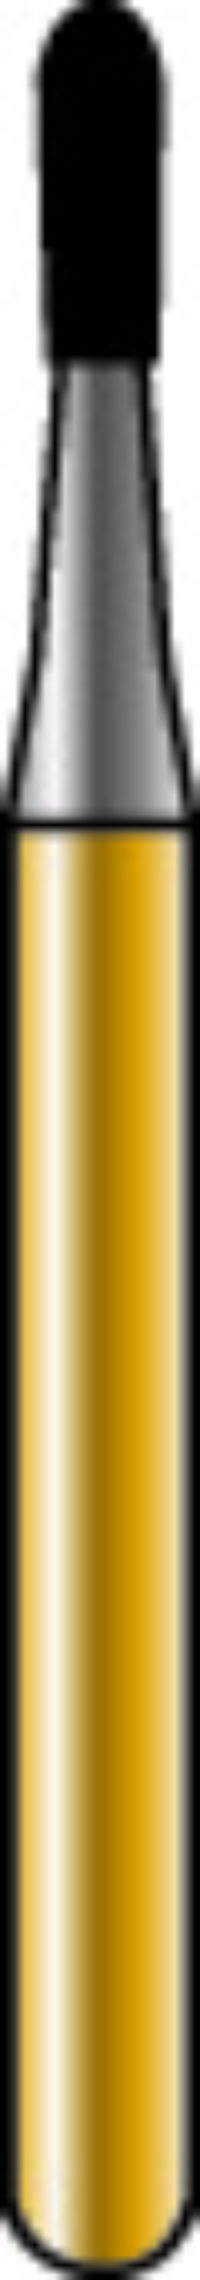 Pear Golden Sharpie